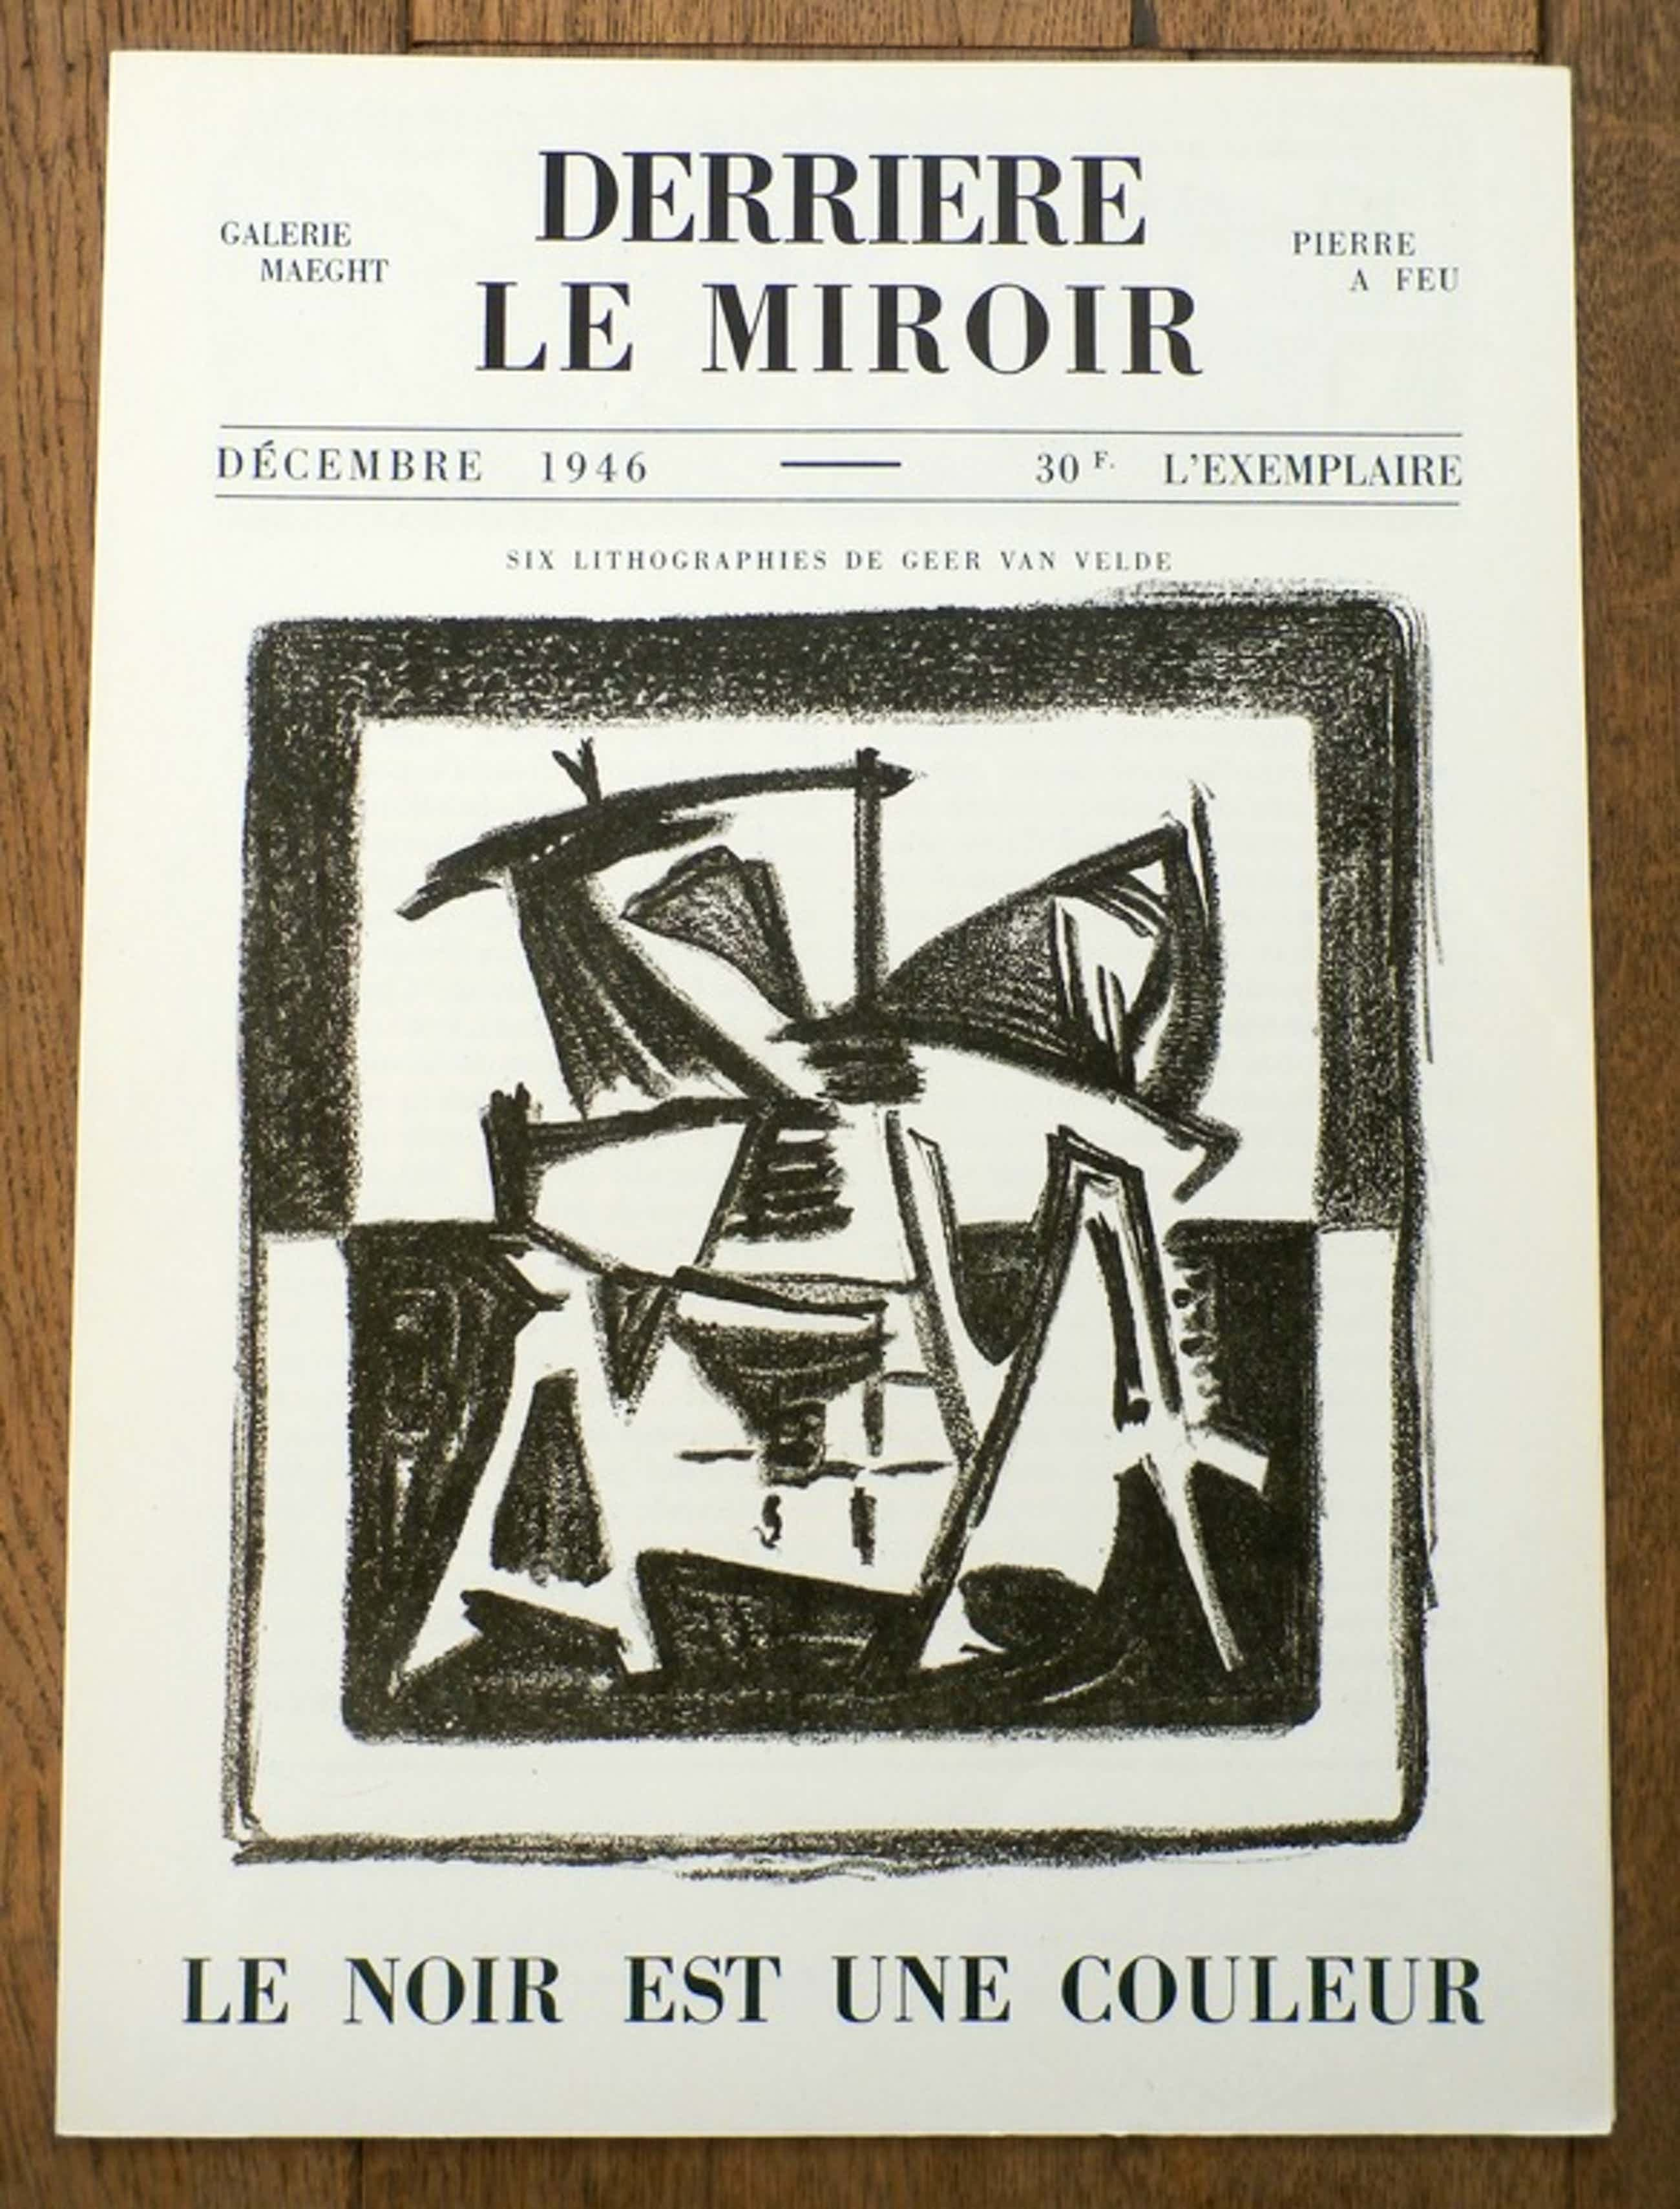 Geer van Velde - Derrière le Miroir nr.1 -- met zes originele litho's - 1946  kopen? Bied vanaf 90!